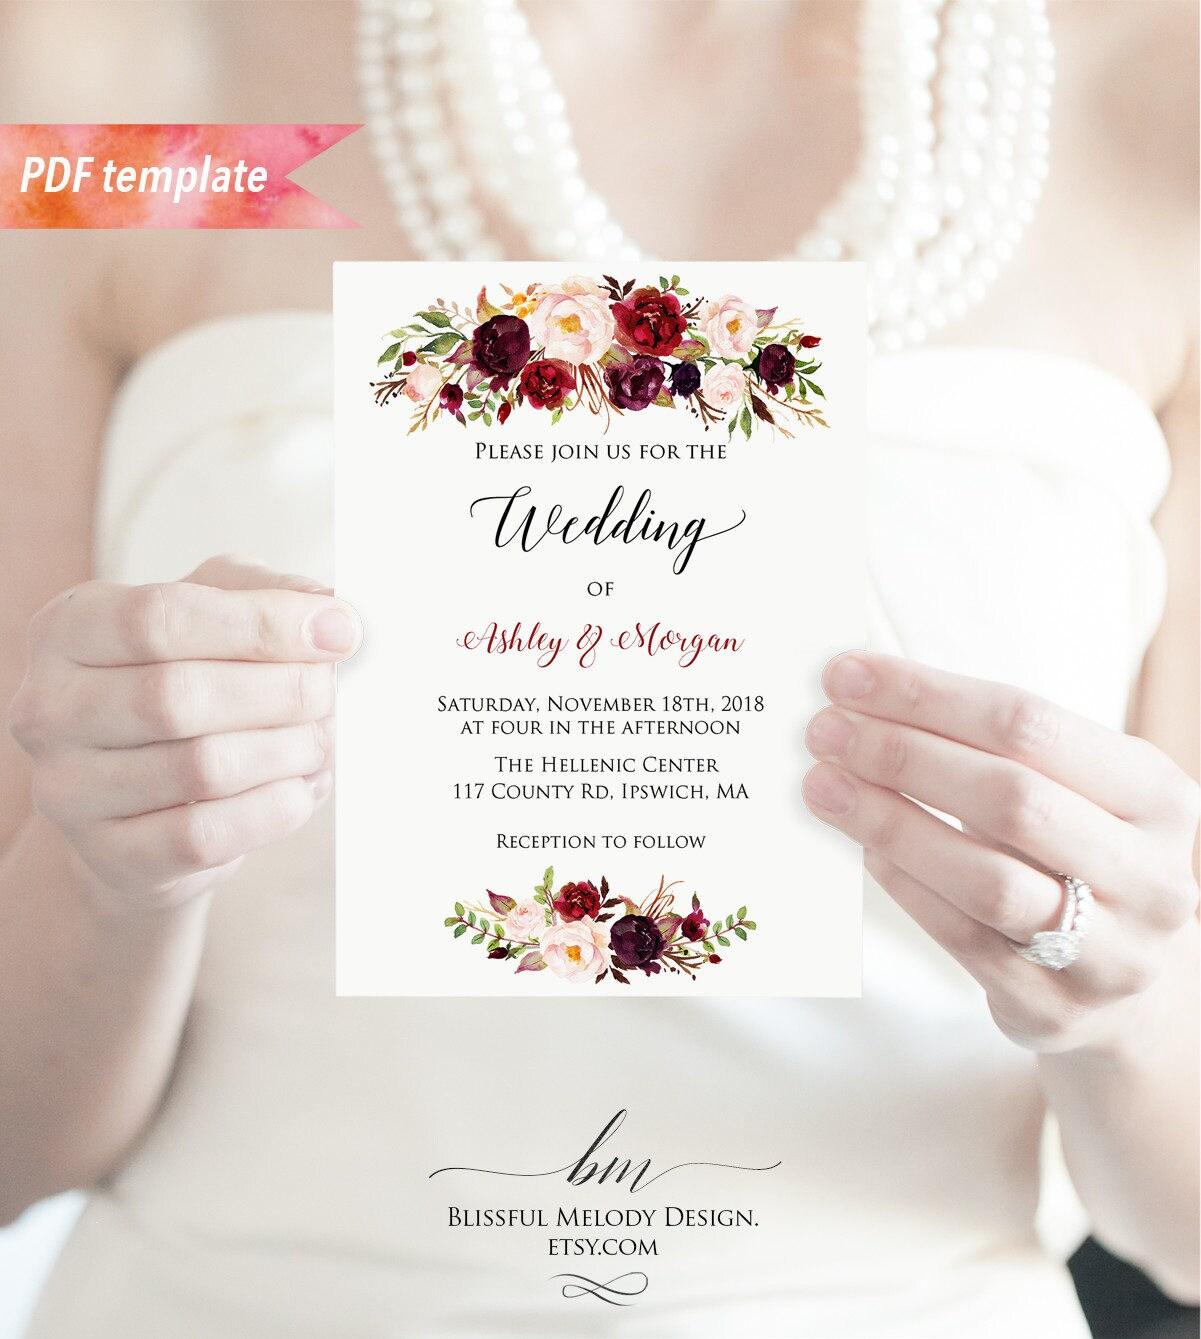 Printable burgundy floral wedding invitation pdf template zoom monicamarmolfo Gallery